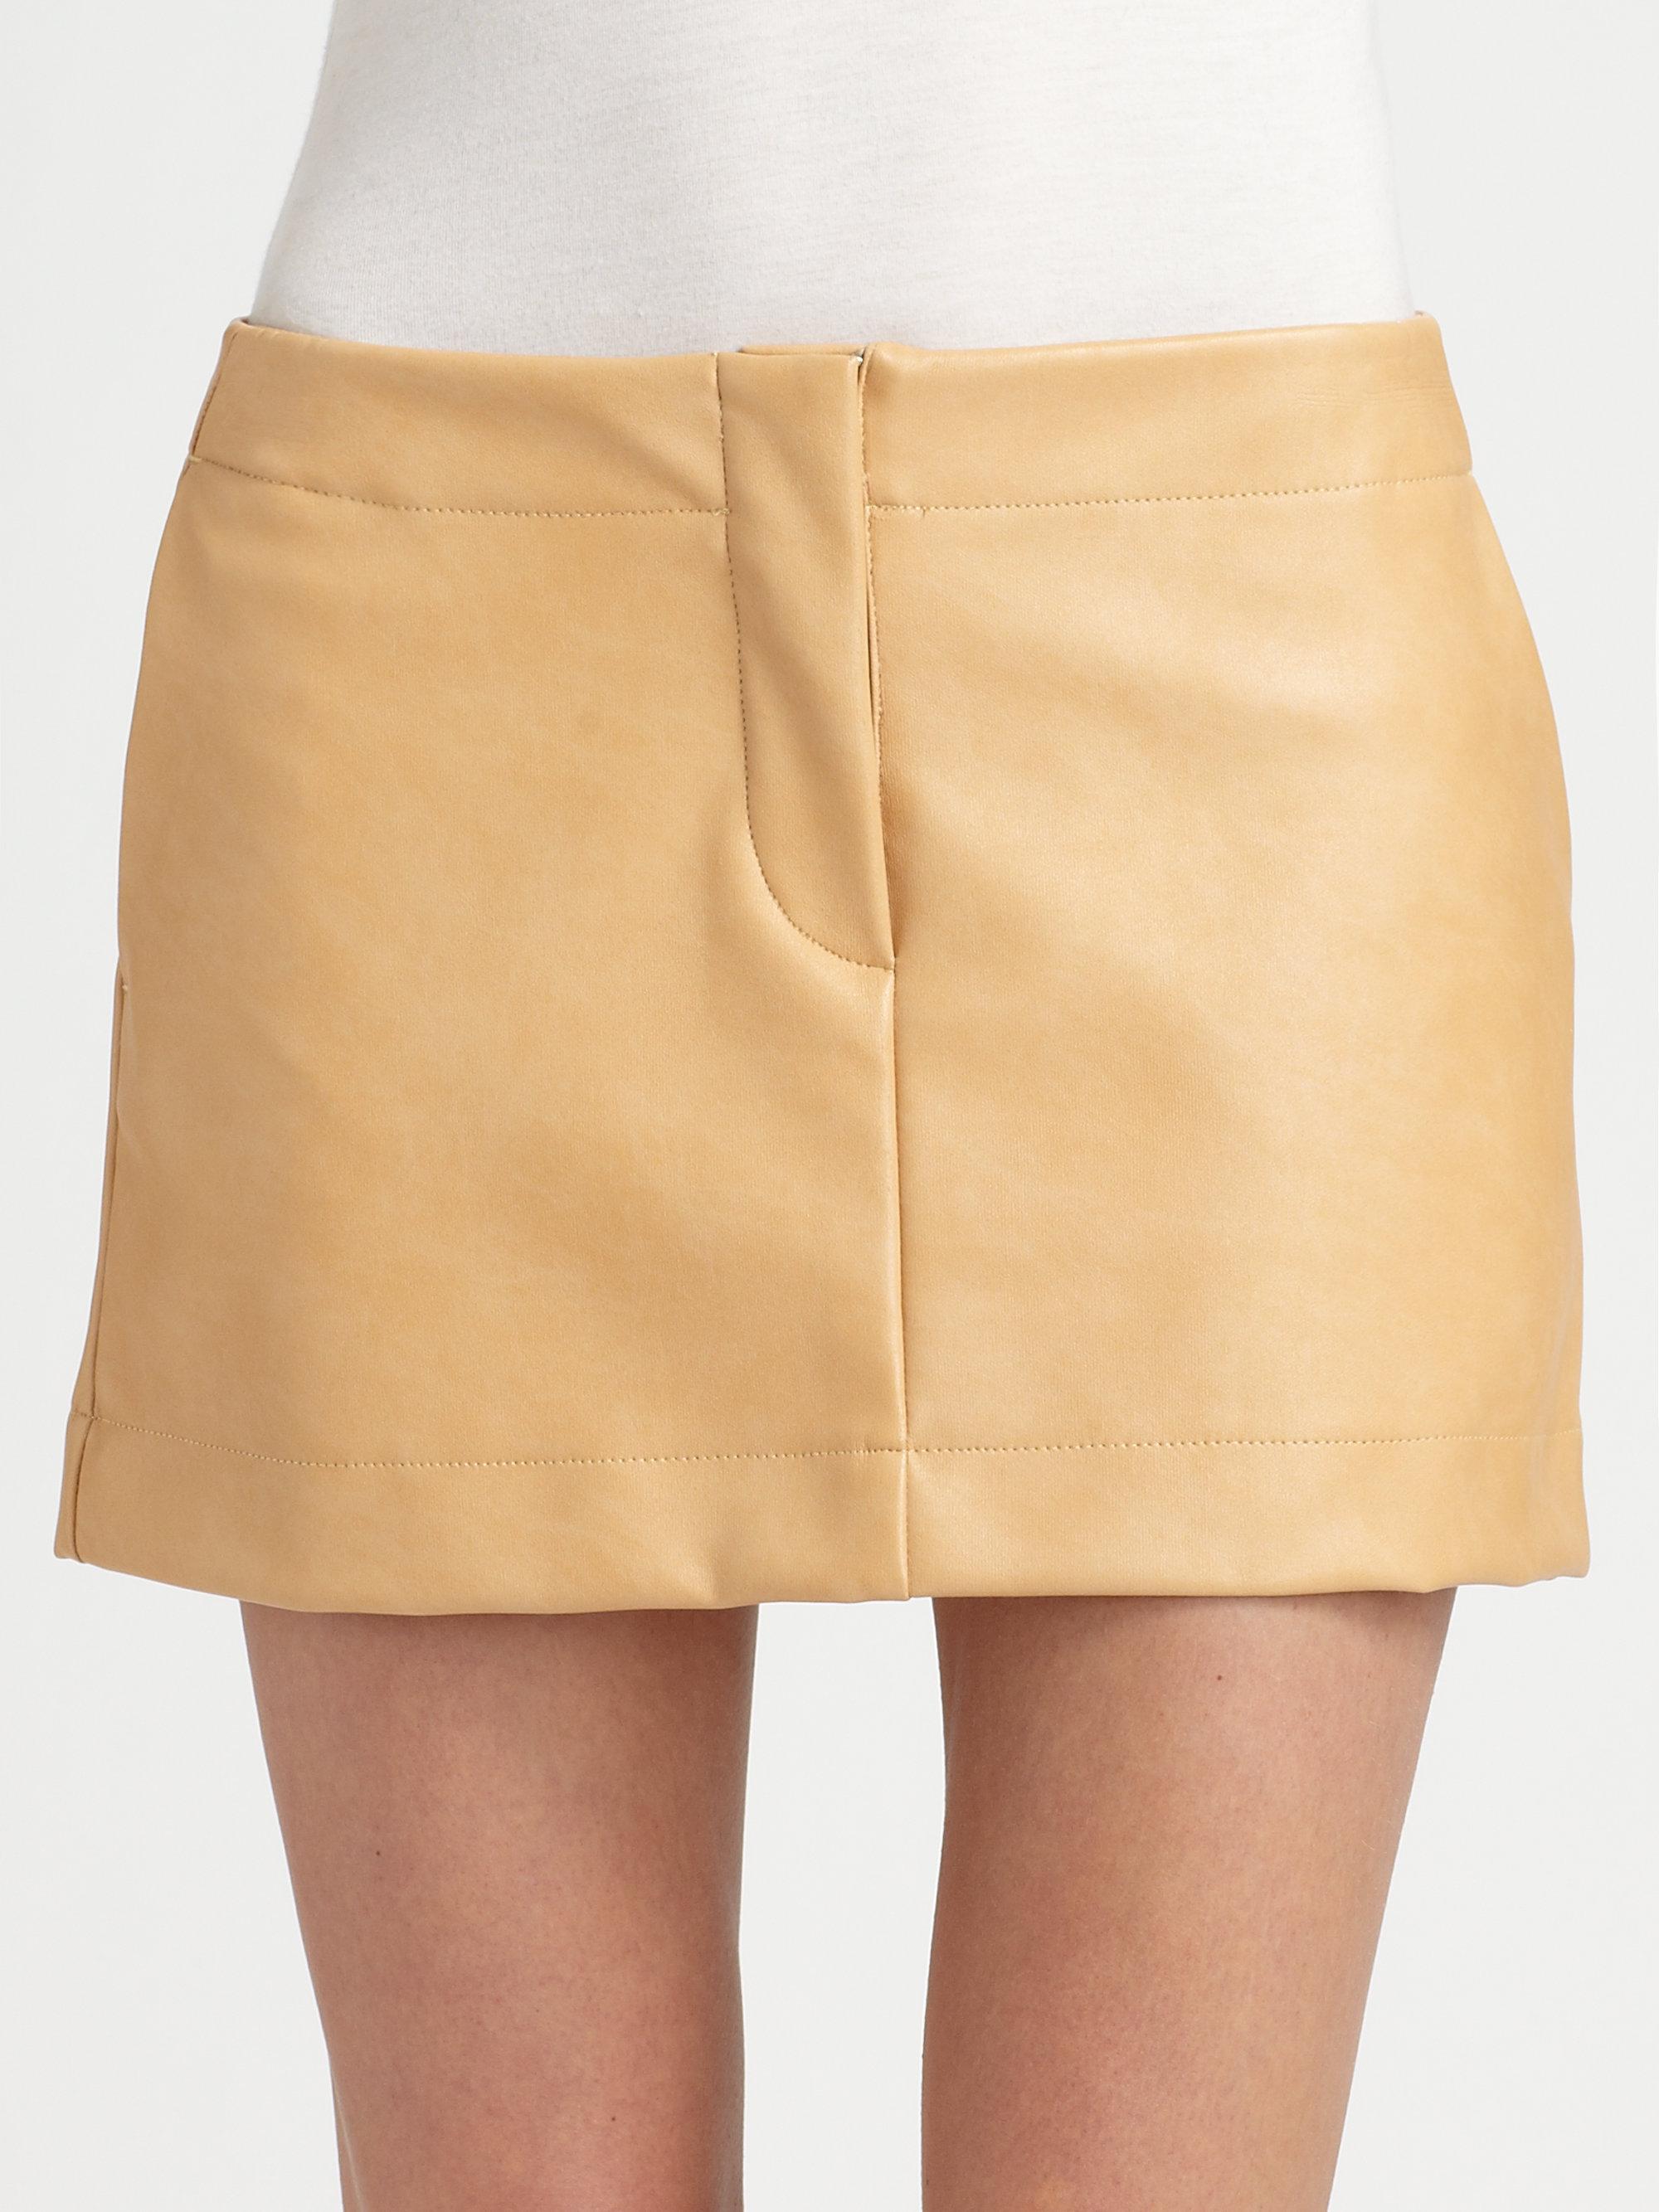 a7f2e5a1ab2be9 joseph-natural-minnie-faux-leather-mini-skirt-product-1-7639473-240058520.jpeg